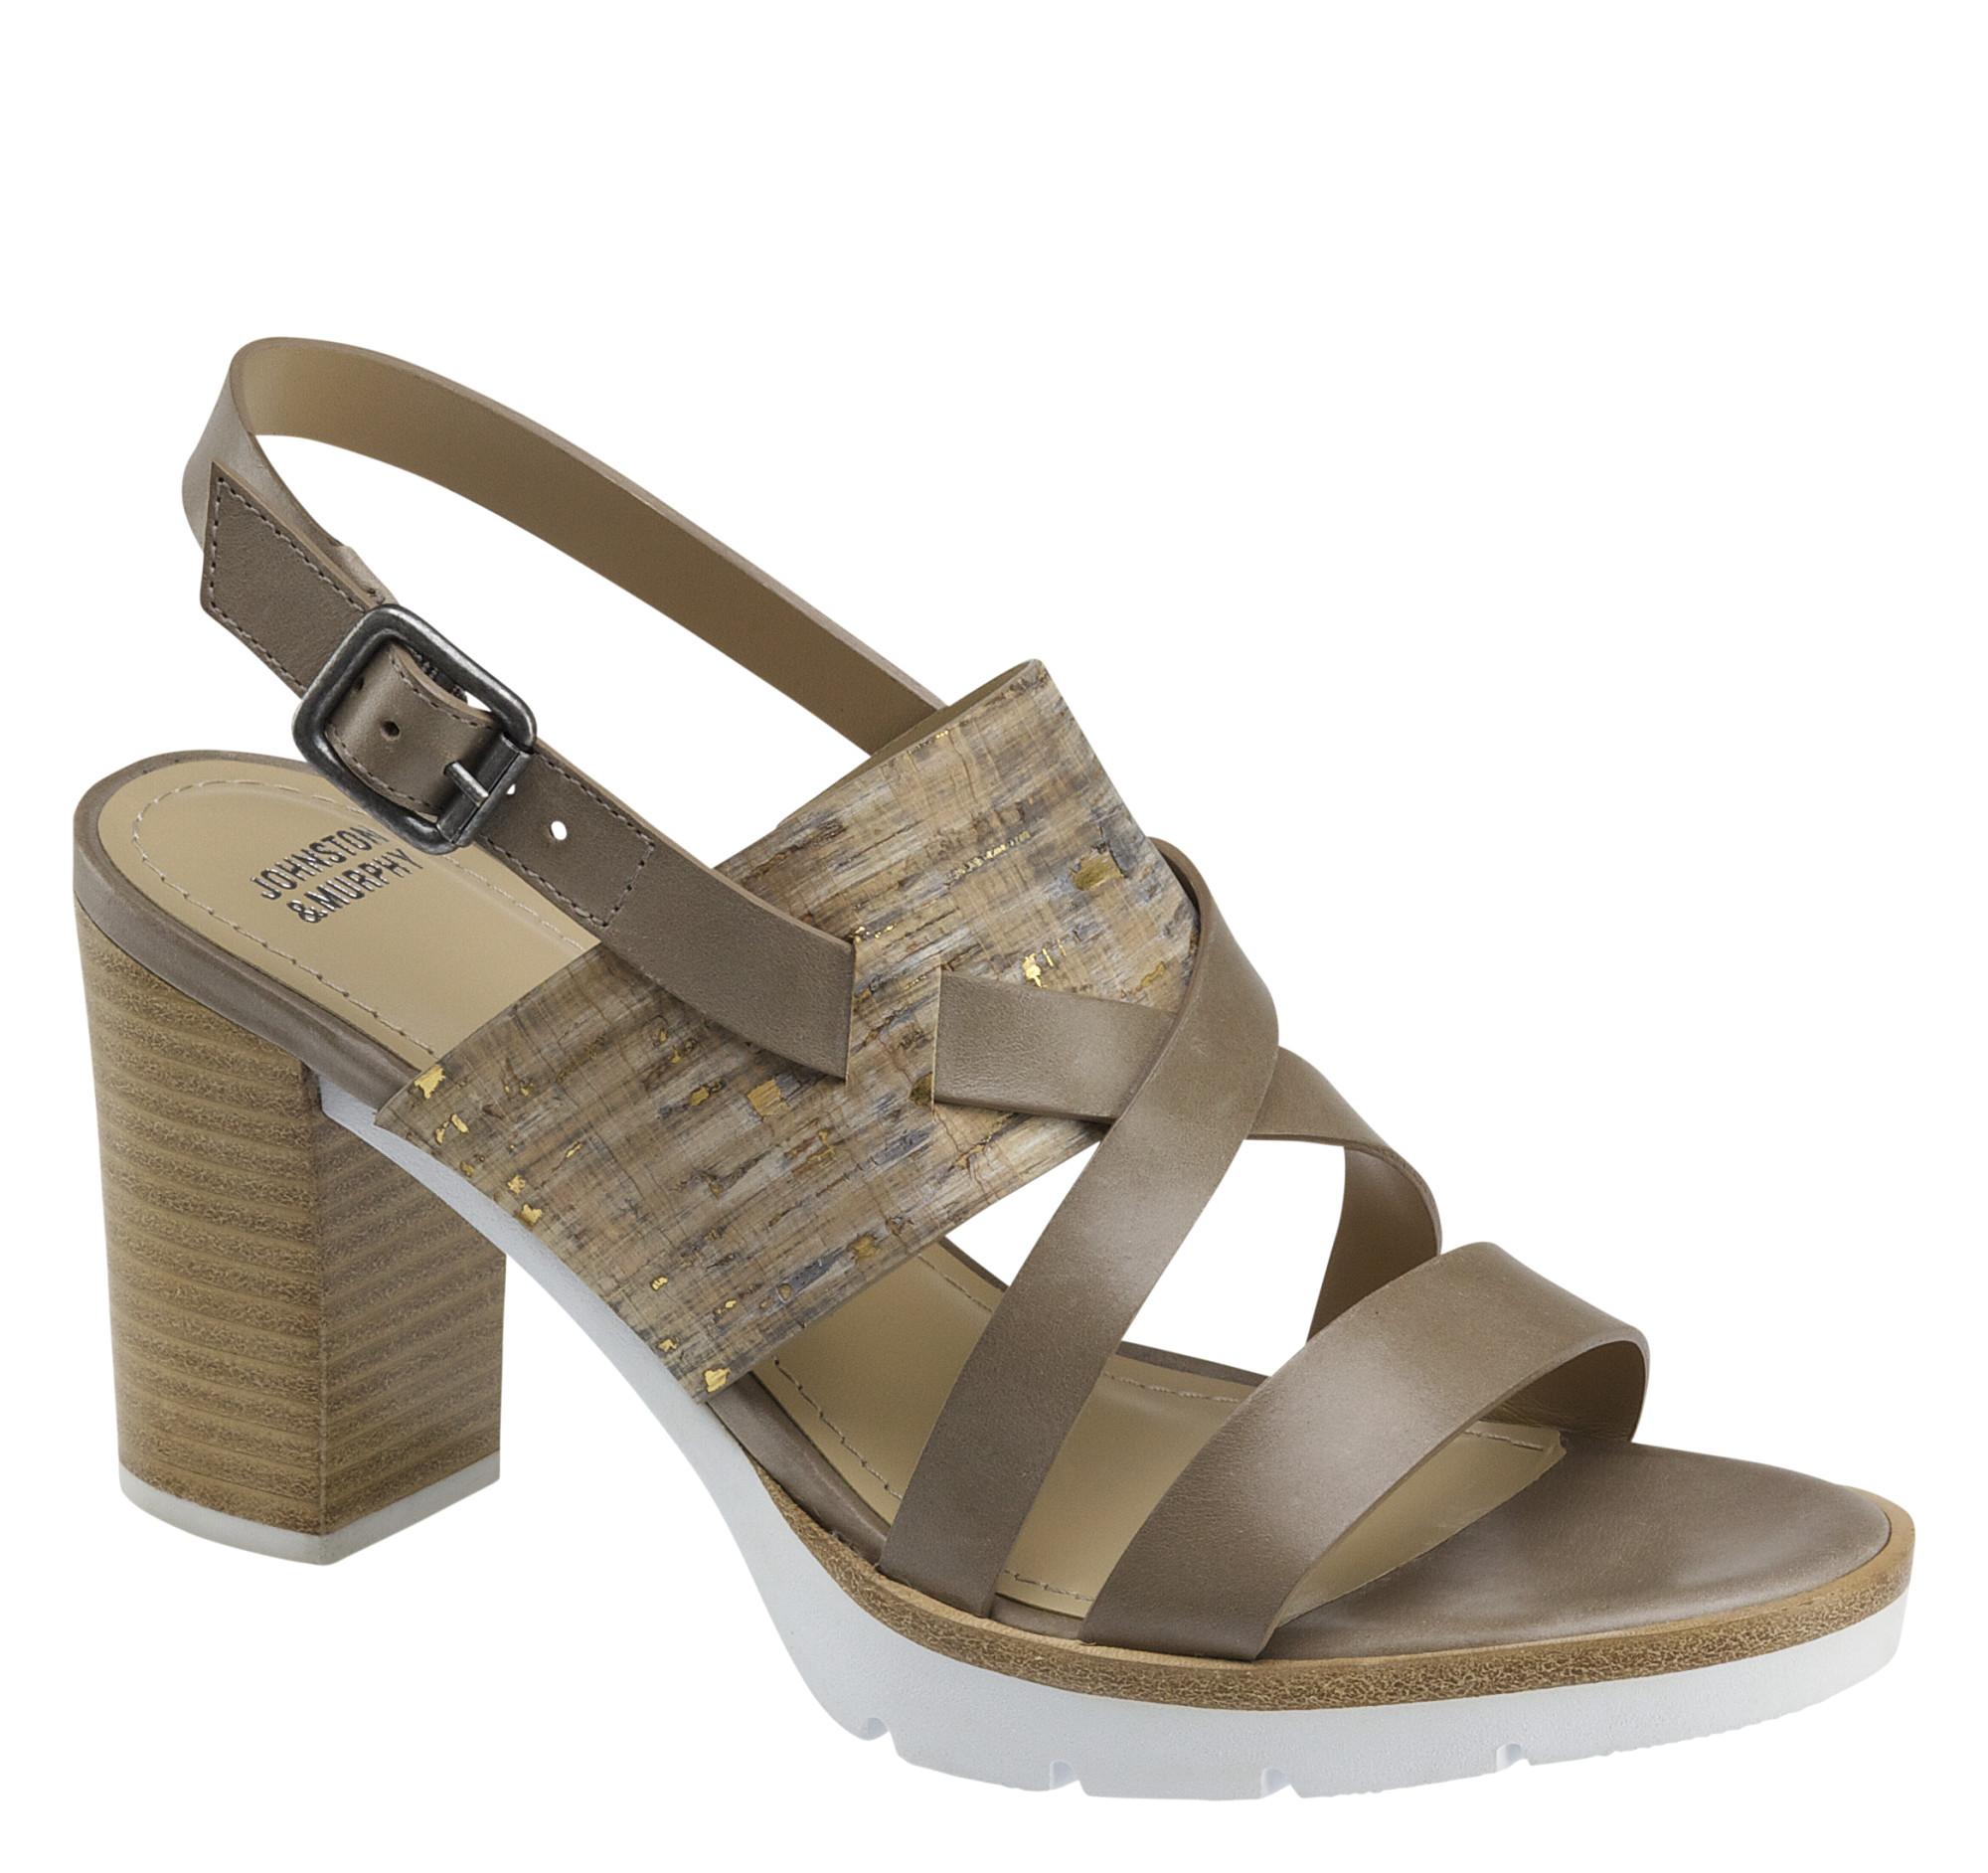 Johnston & Murphy Kayla Cross-Strap Sandal